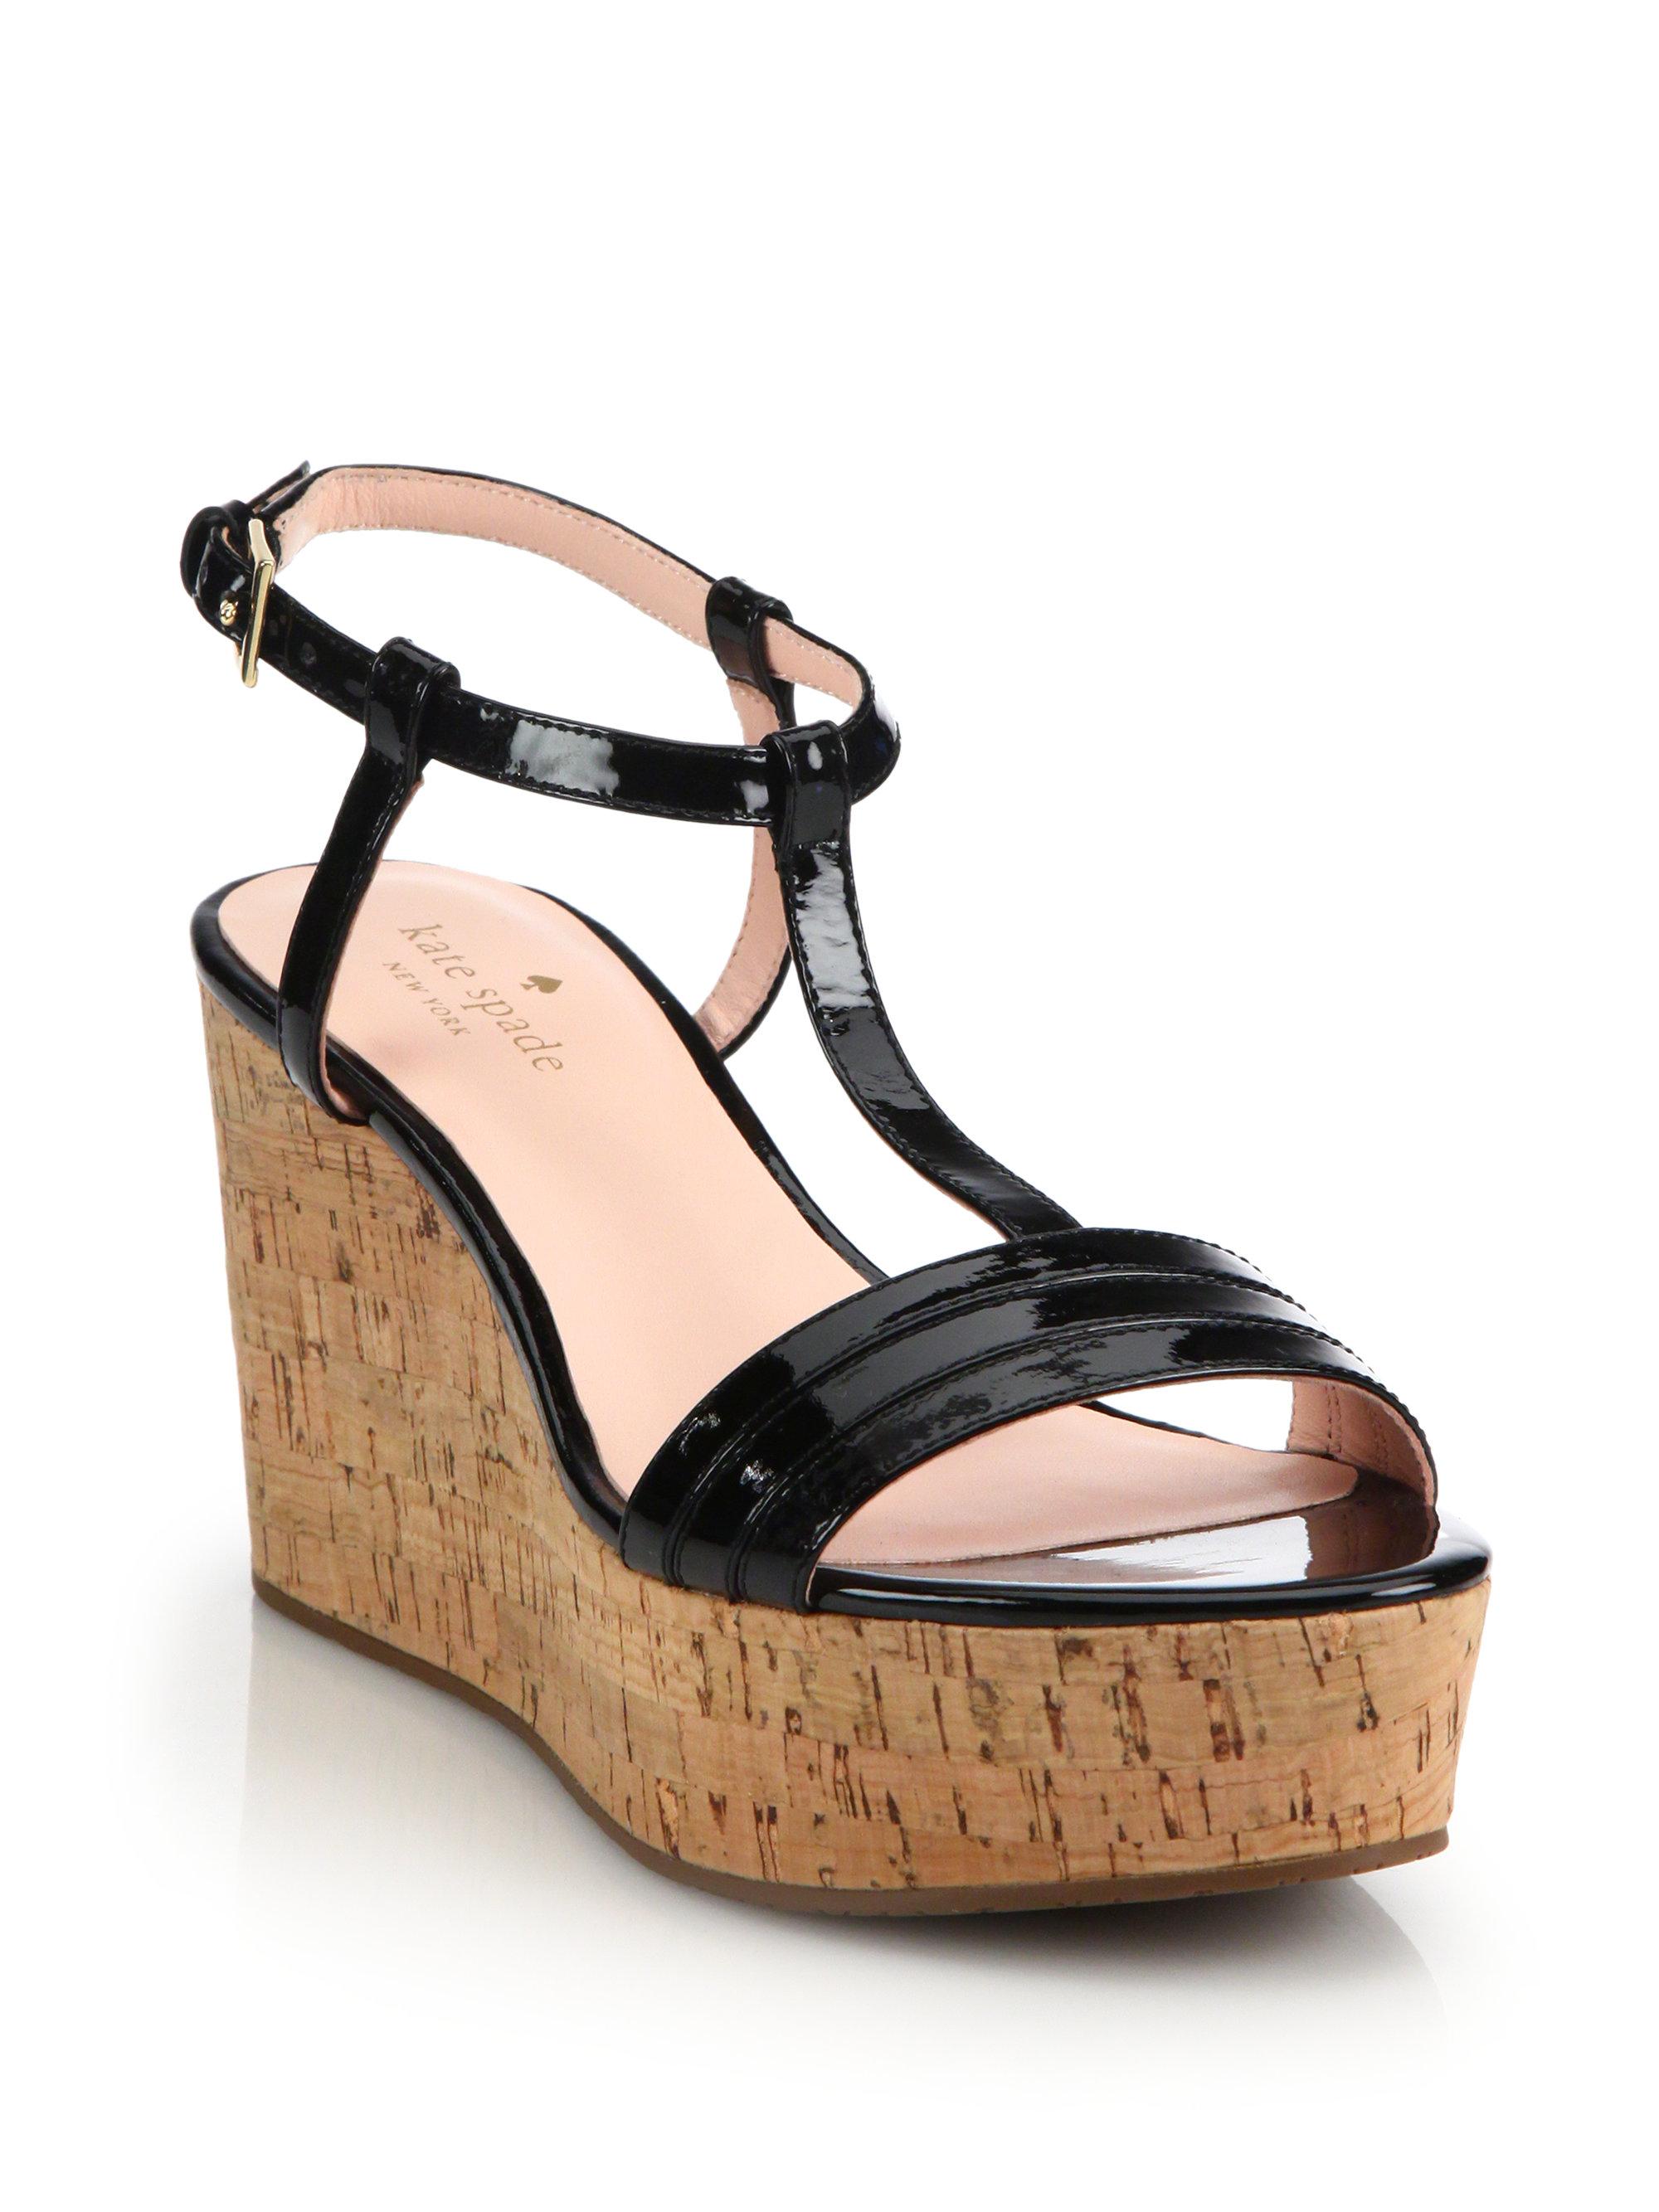 e7a9f3adfbd Lyst - Kate Spade Tallin Cork Platform Wedge Sandals in Black